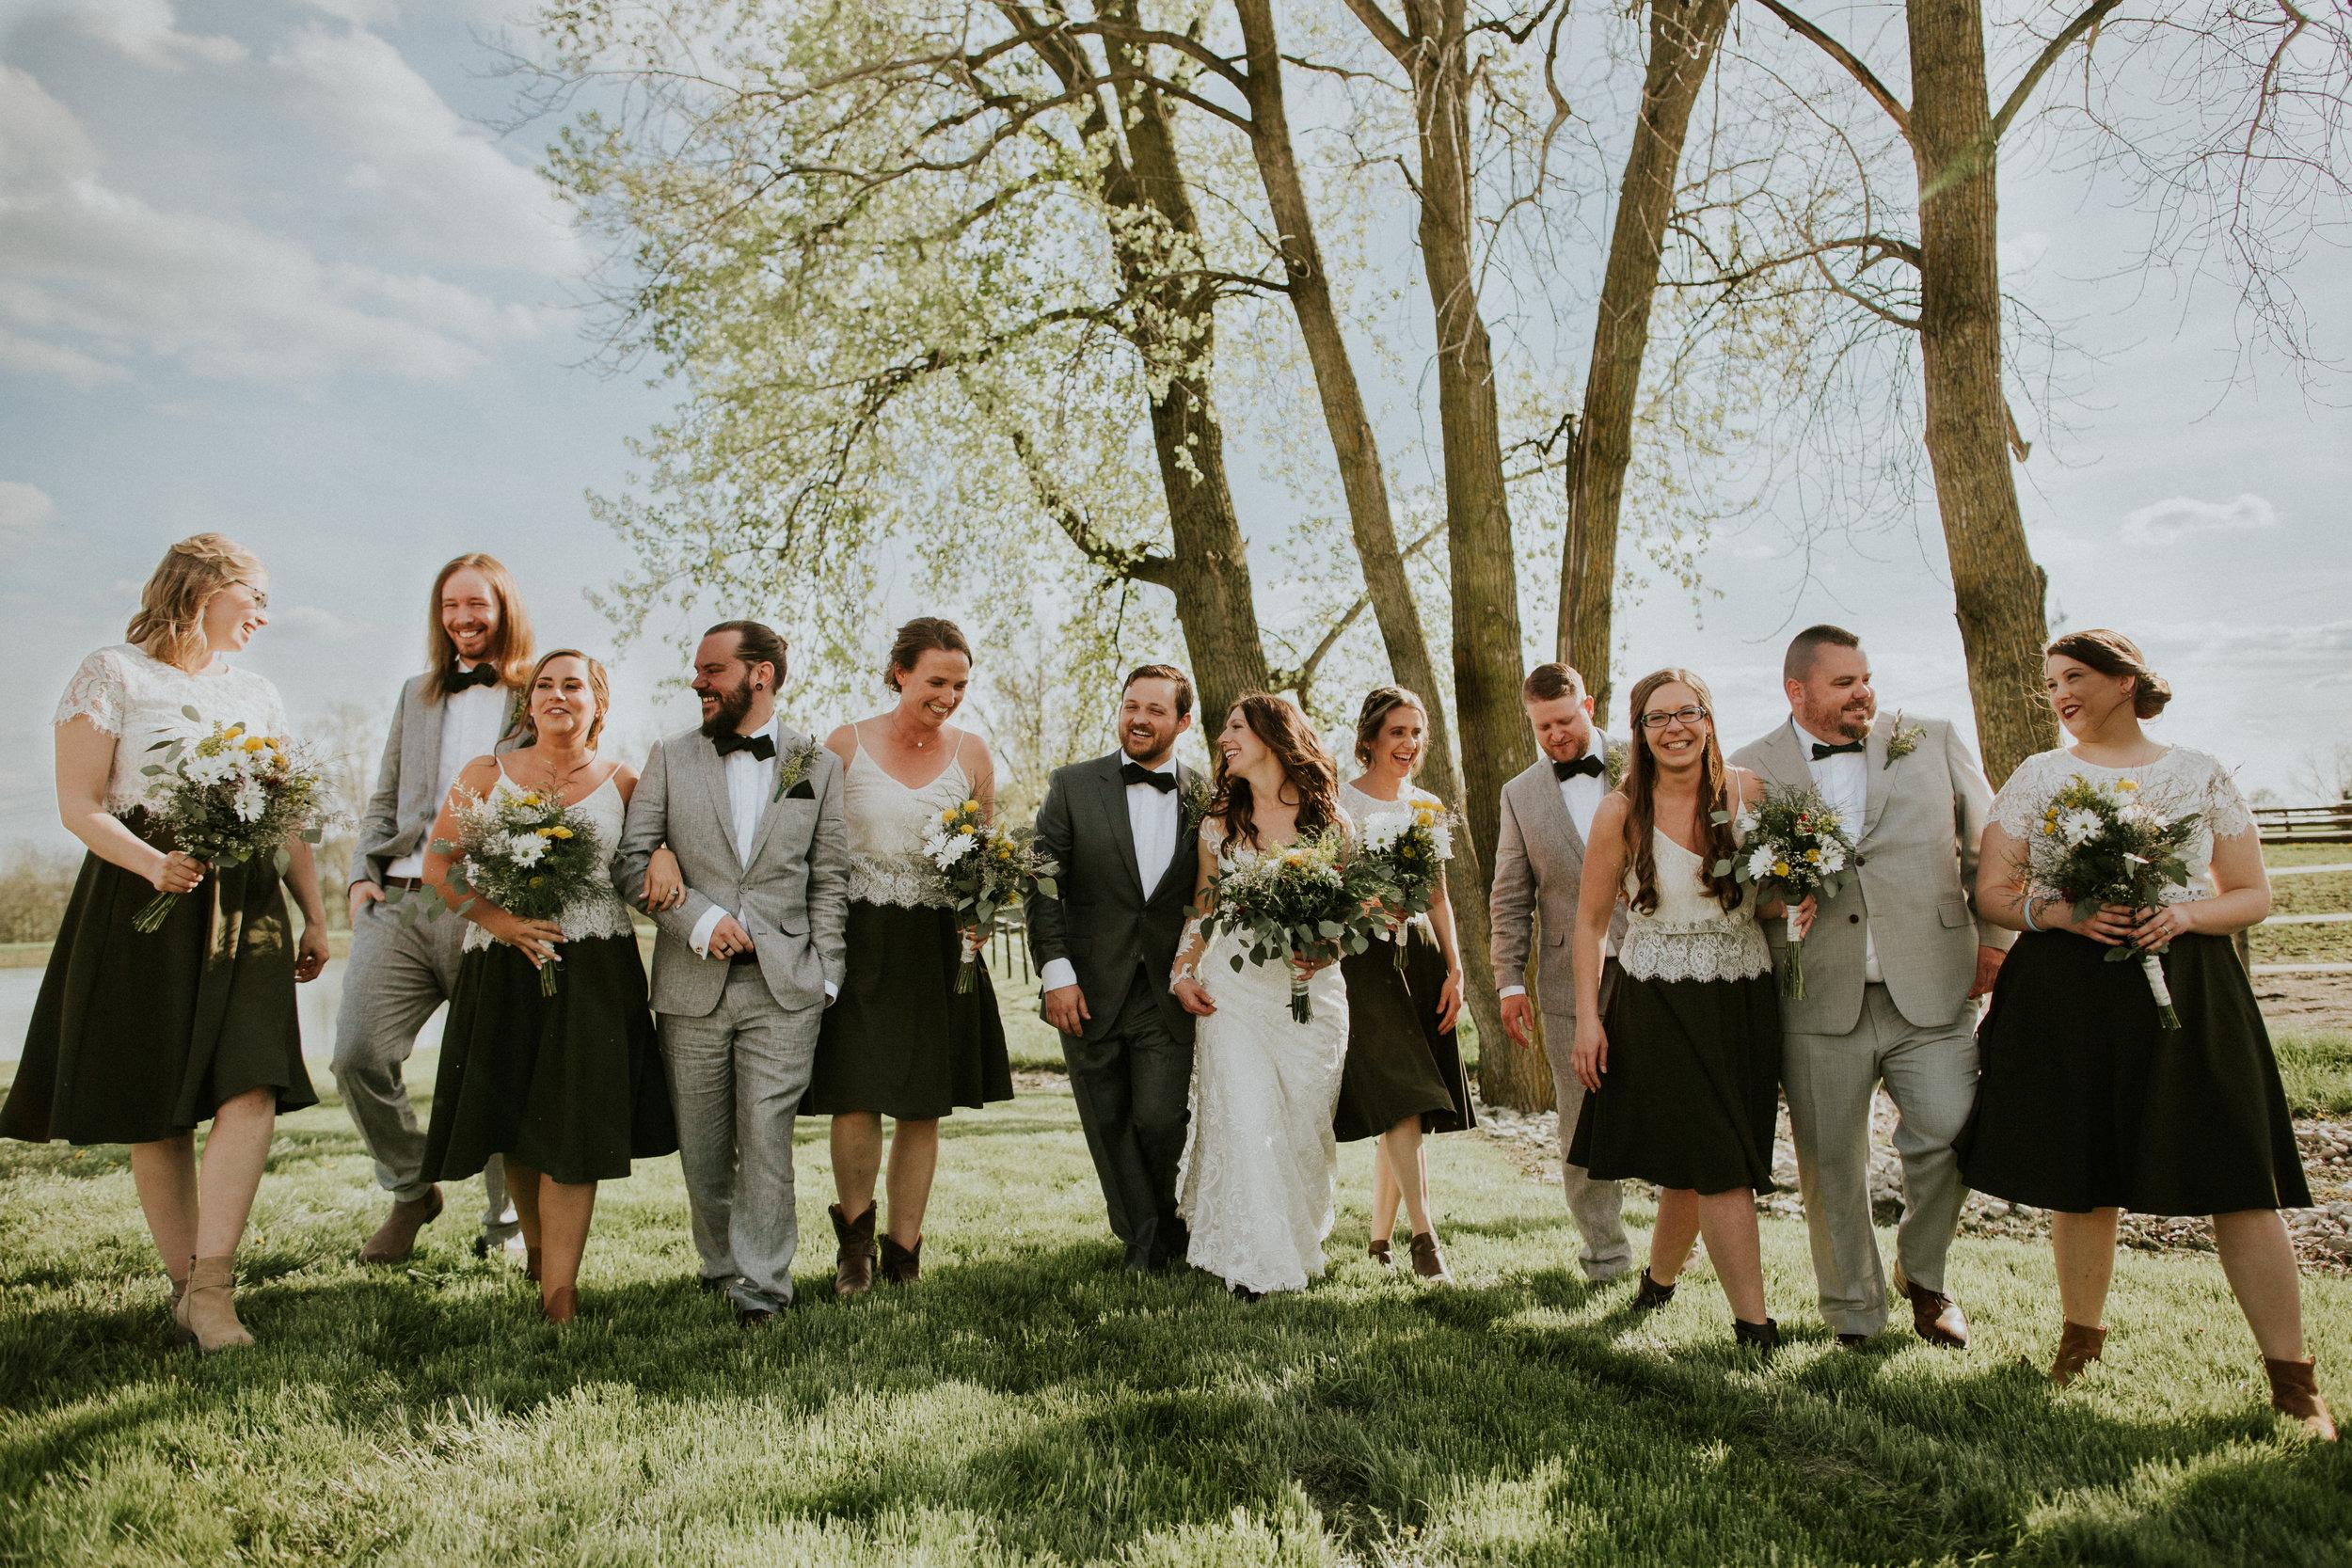 James-Megan_Wedding-Day_LILLER-PHOTO-543.jpg